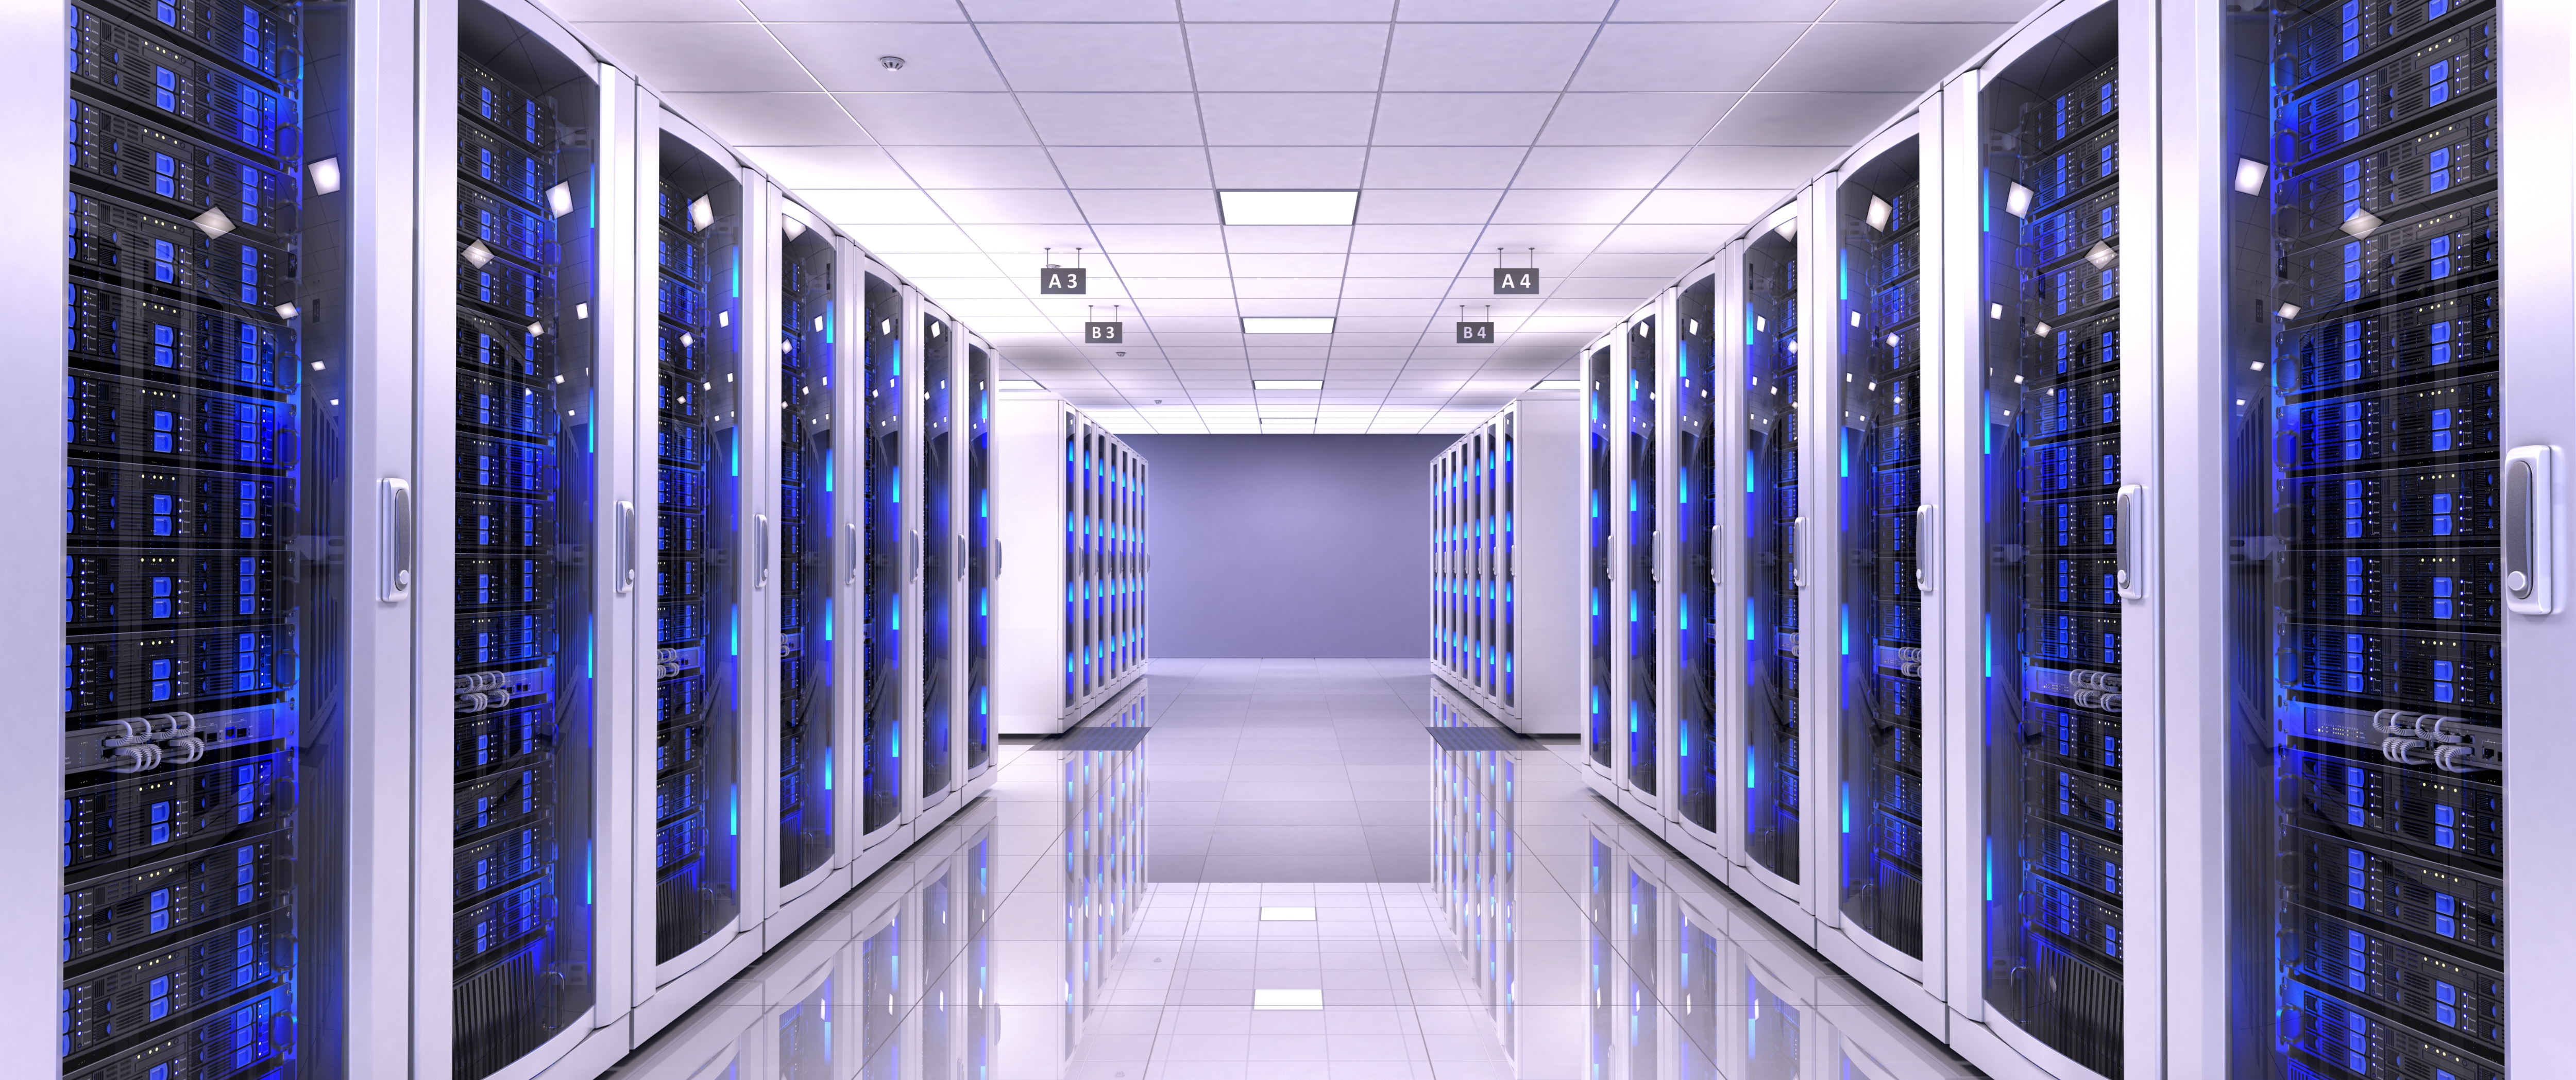 Hd Wallpaper Server Background 5000x2097 Download Hd Wallpaper Wallpapertip